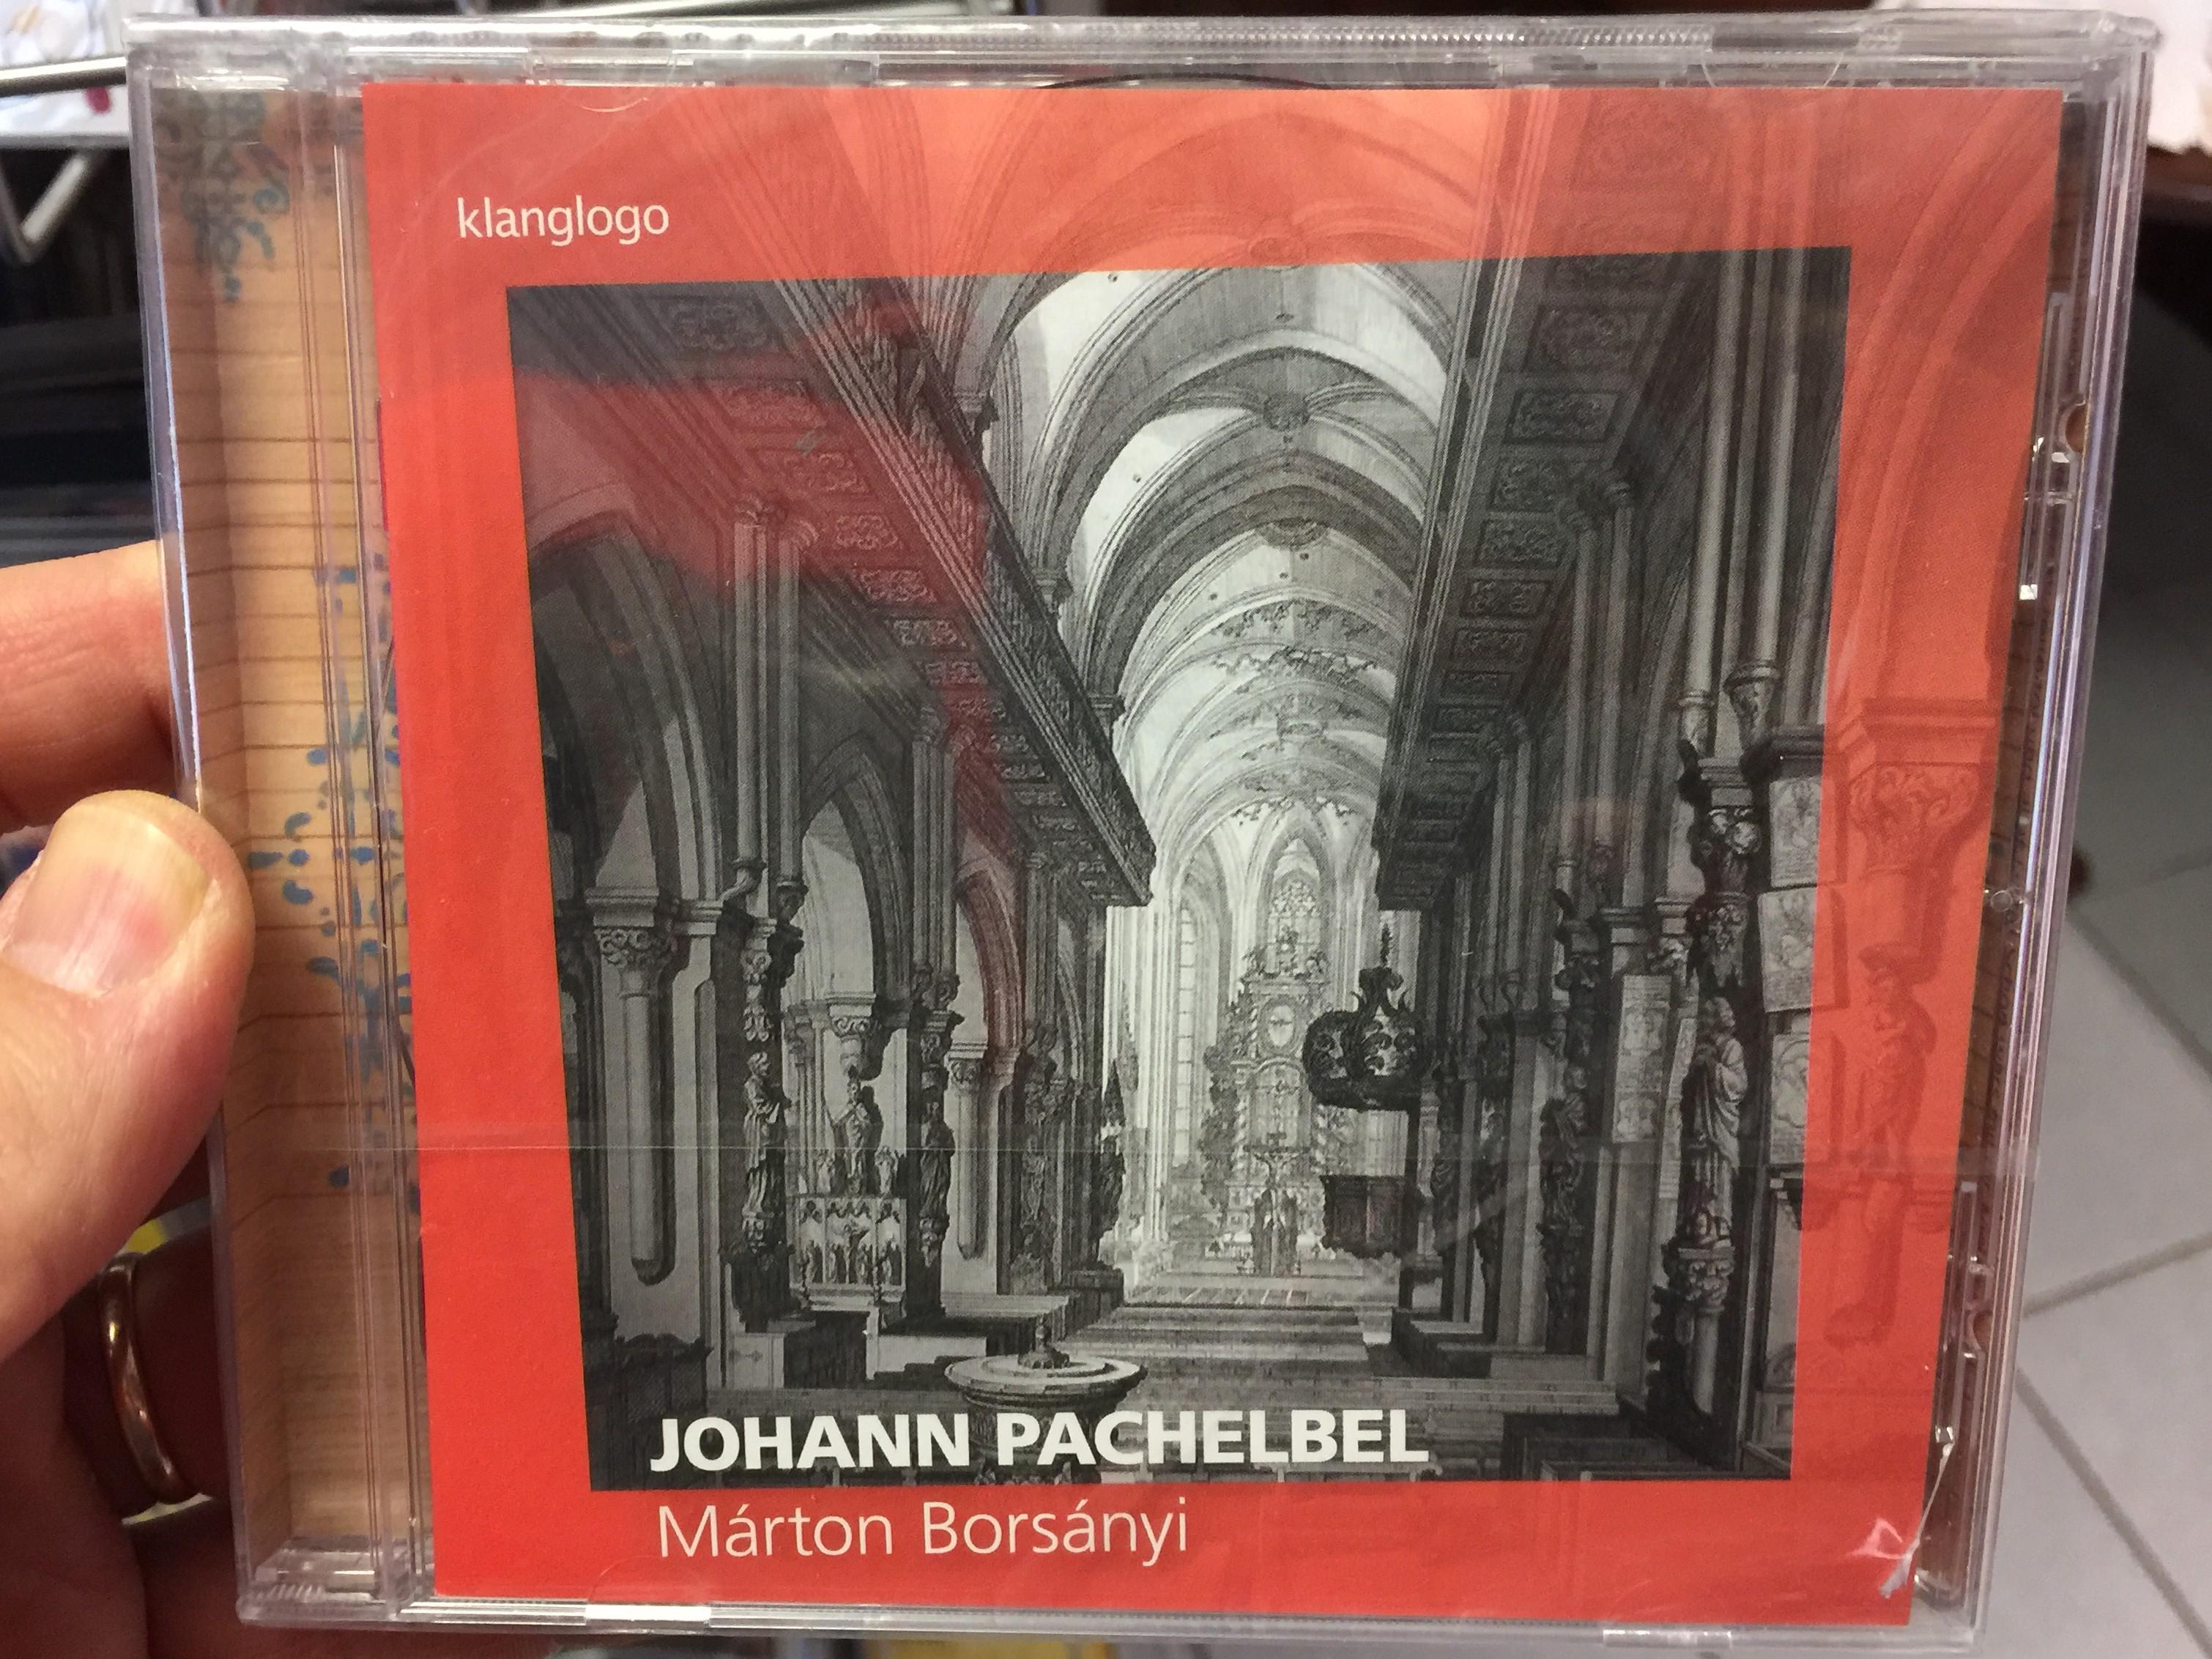 johann-pachelbel-m-rton-bors-nyi-cembalo-organ-klanglogo-1.jpg